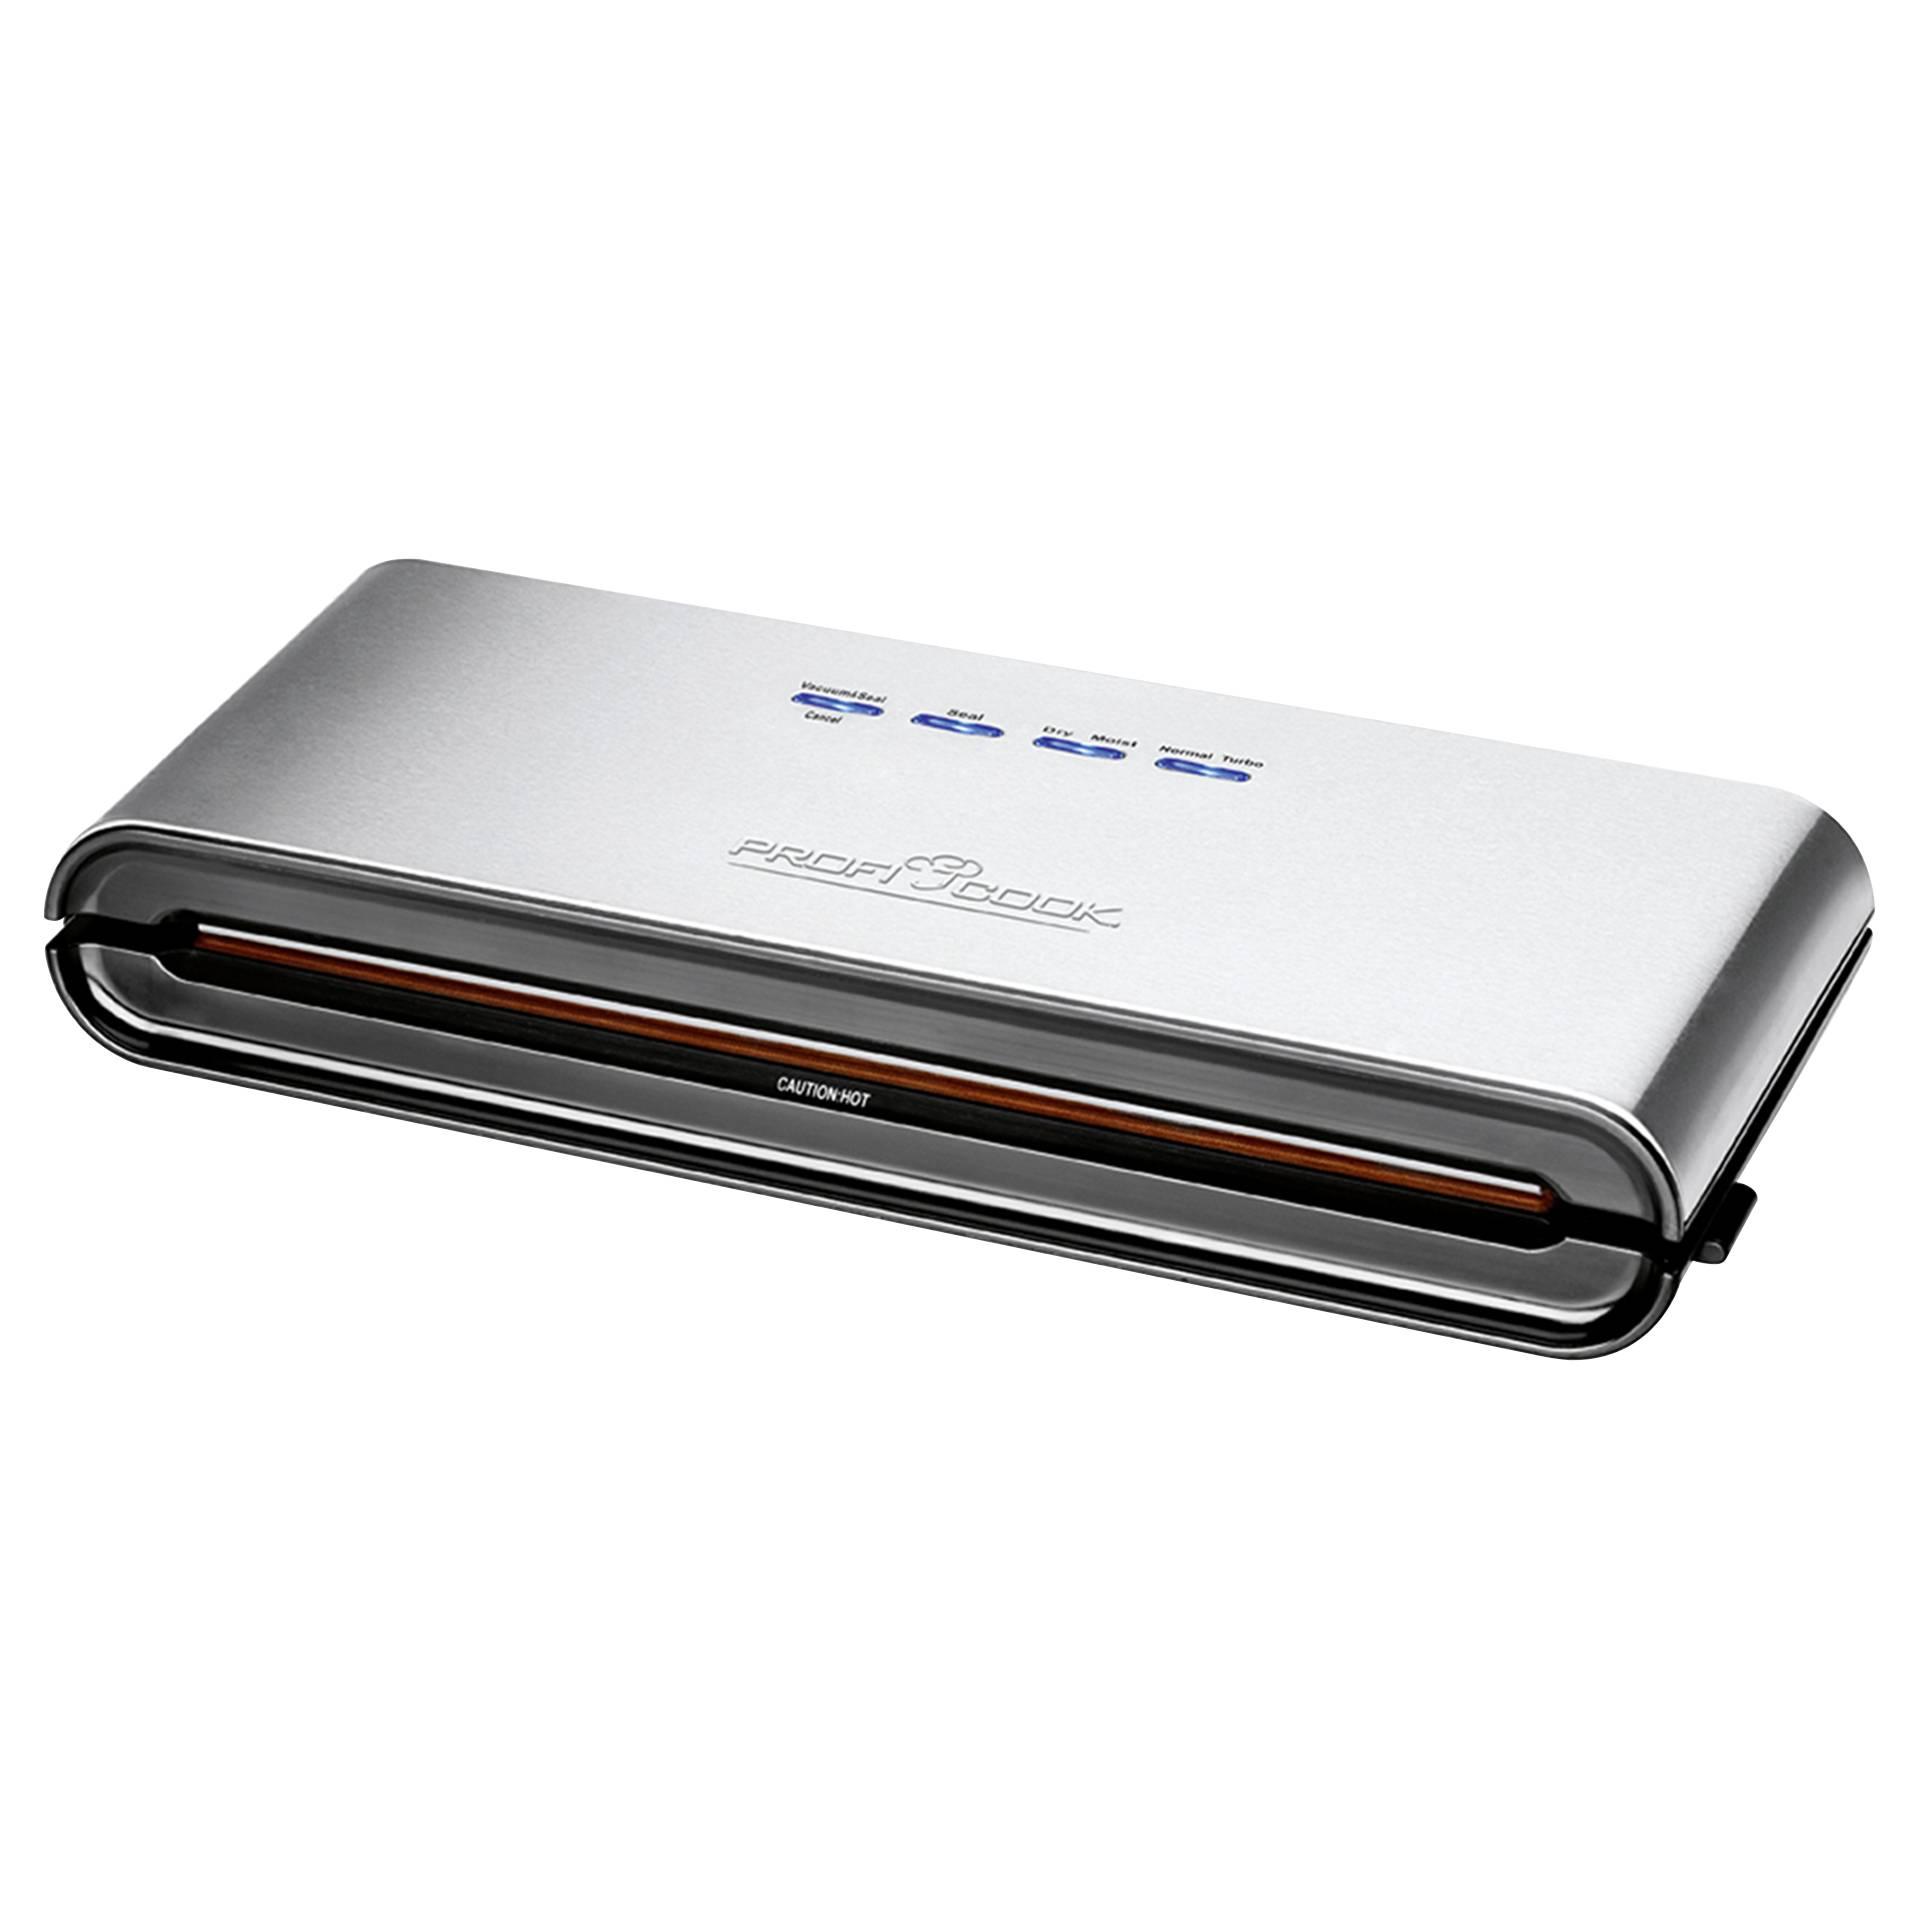 Proficook PC-VK 1080 PC